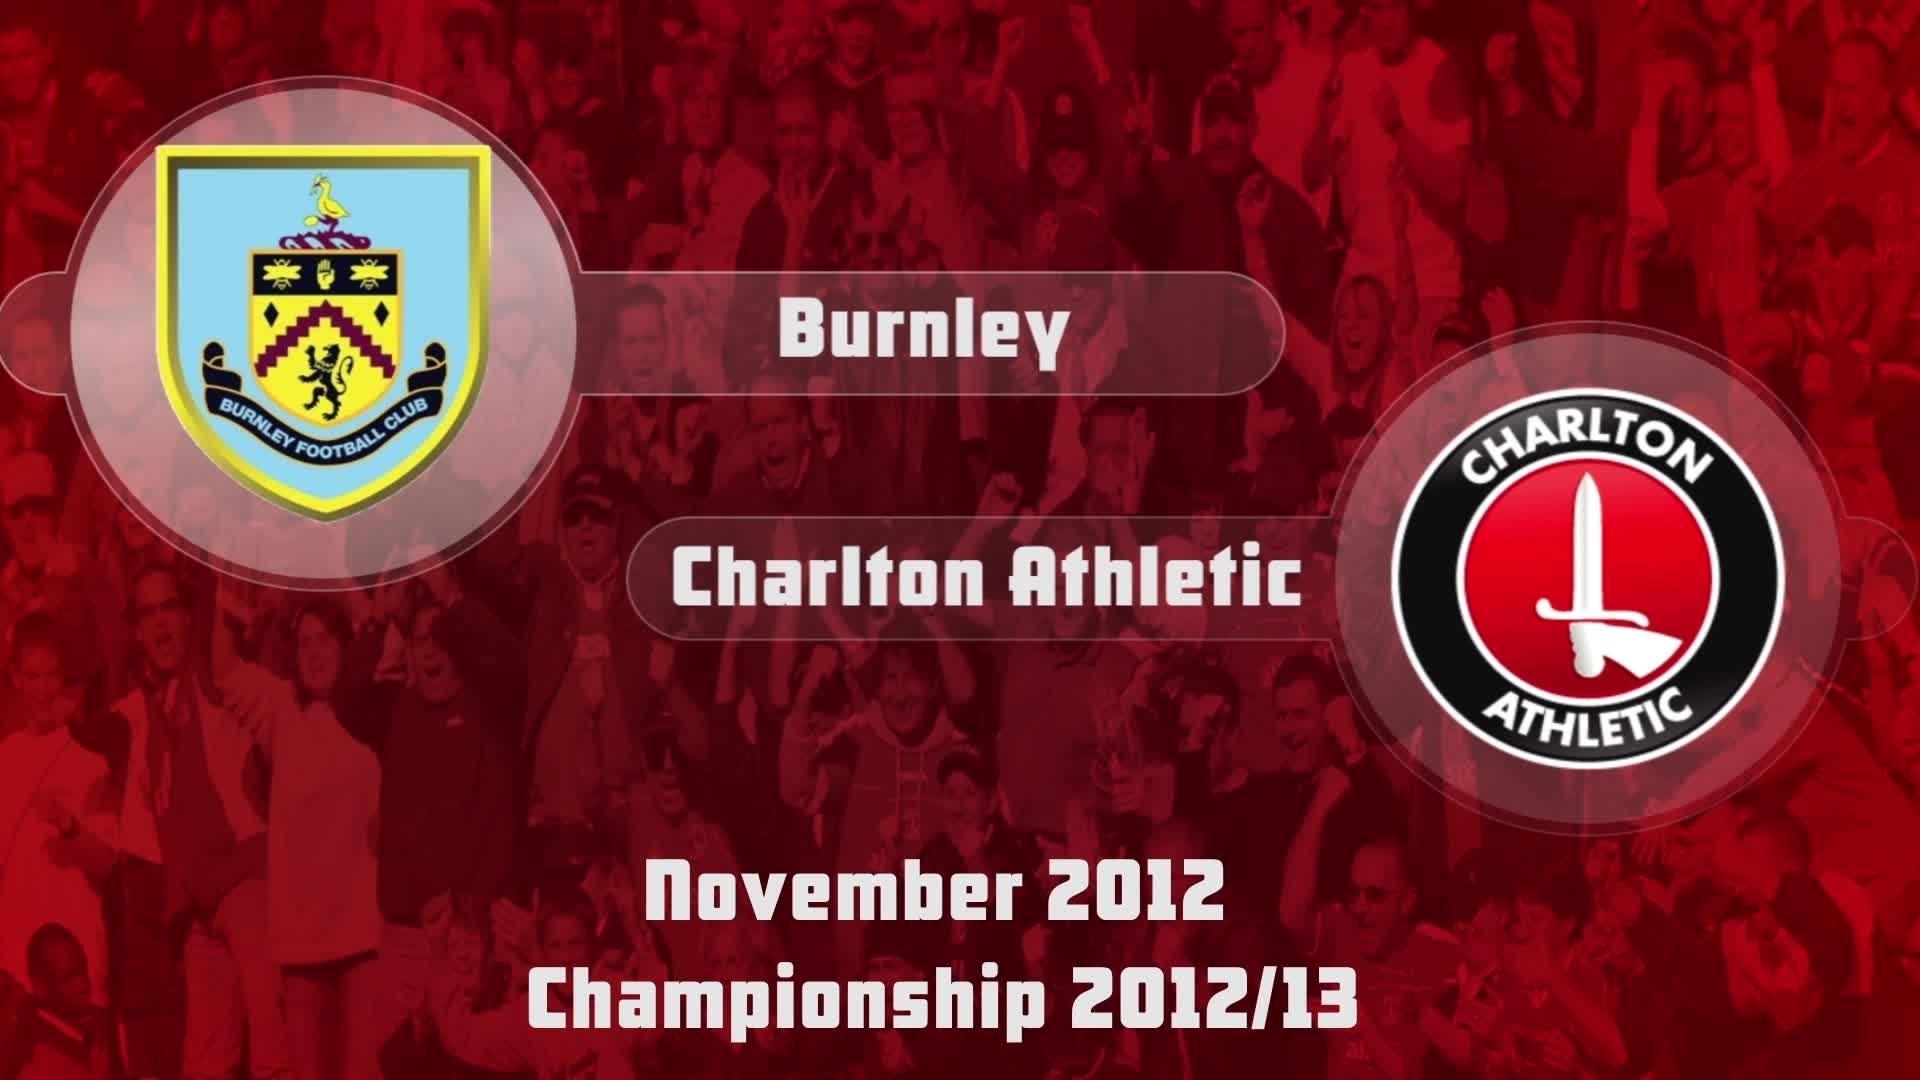 18 HIGHLIGHTS | Burnley 0 Charlton 1 (Nov 2012)